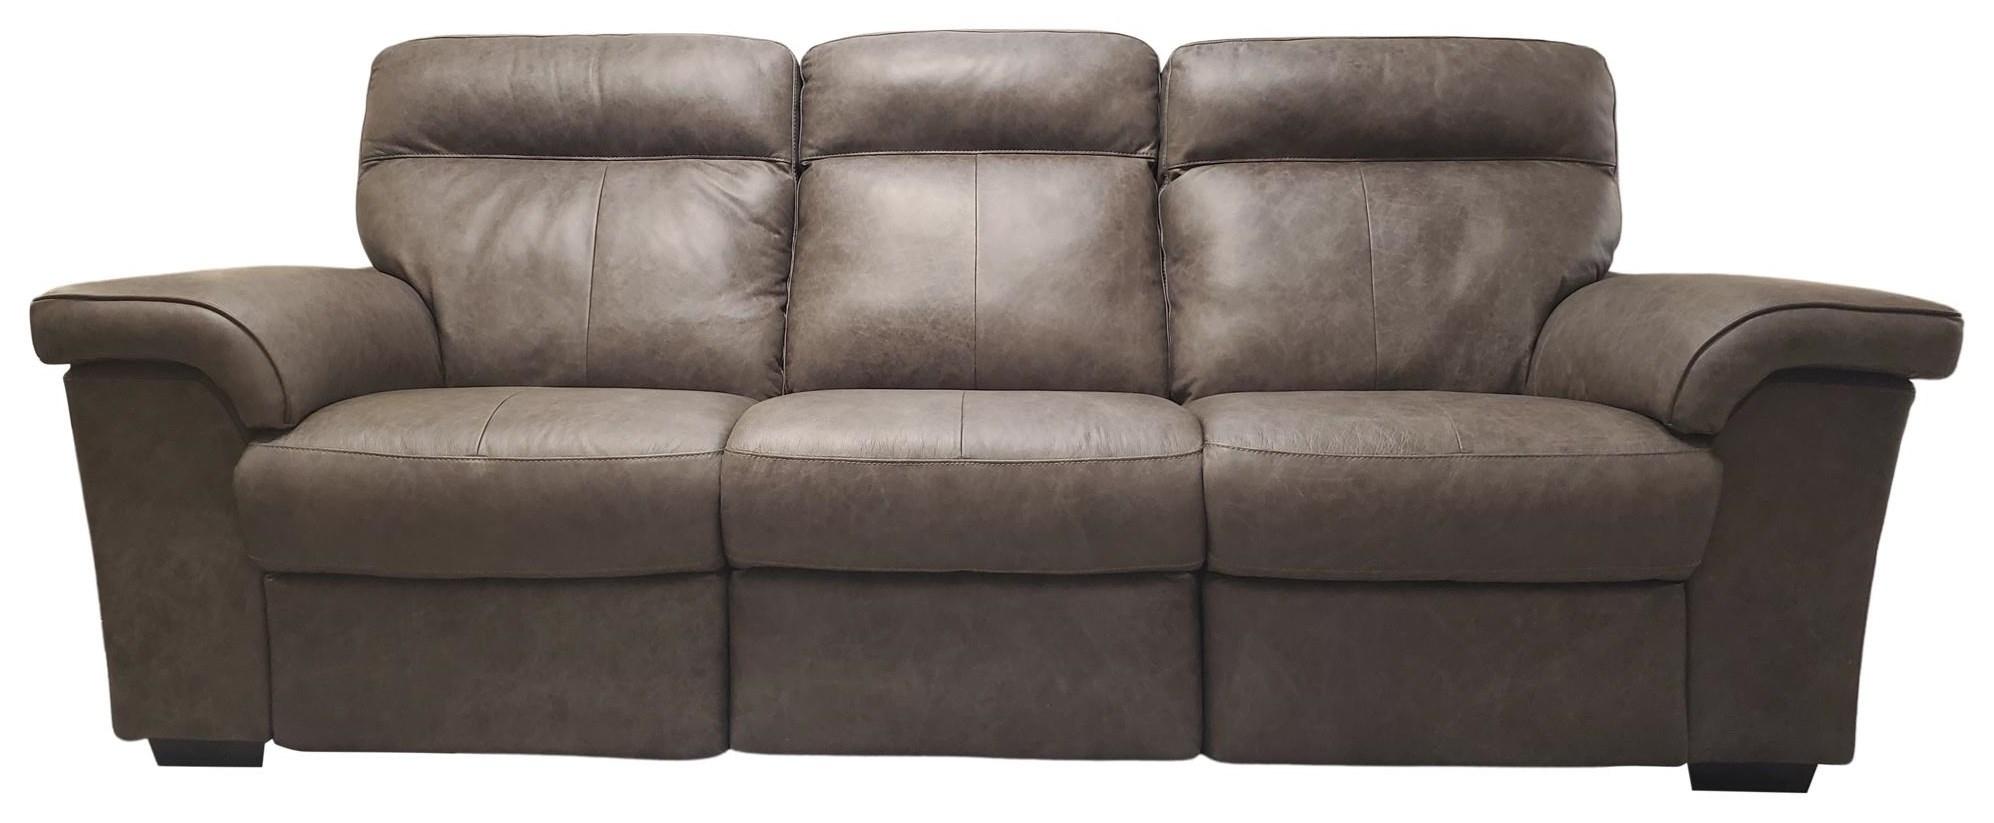 Alaska Reclining Sofa by Palliser at Upper Room Home Furnishings